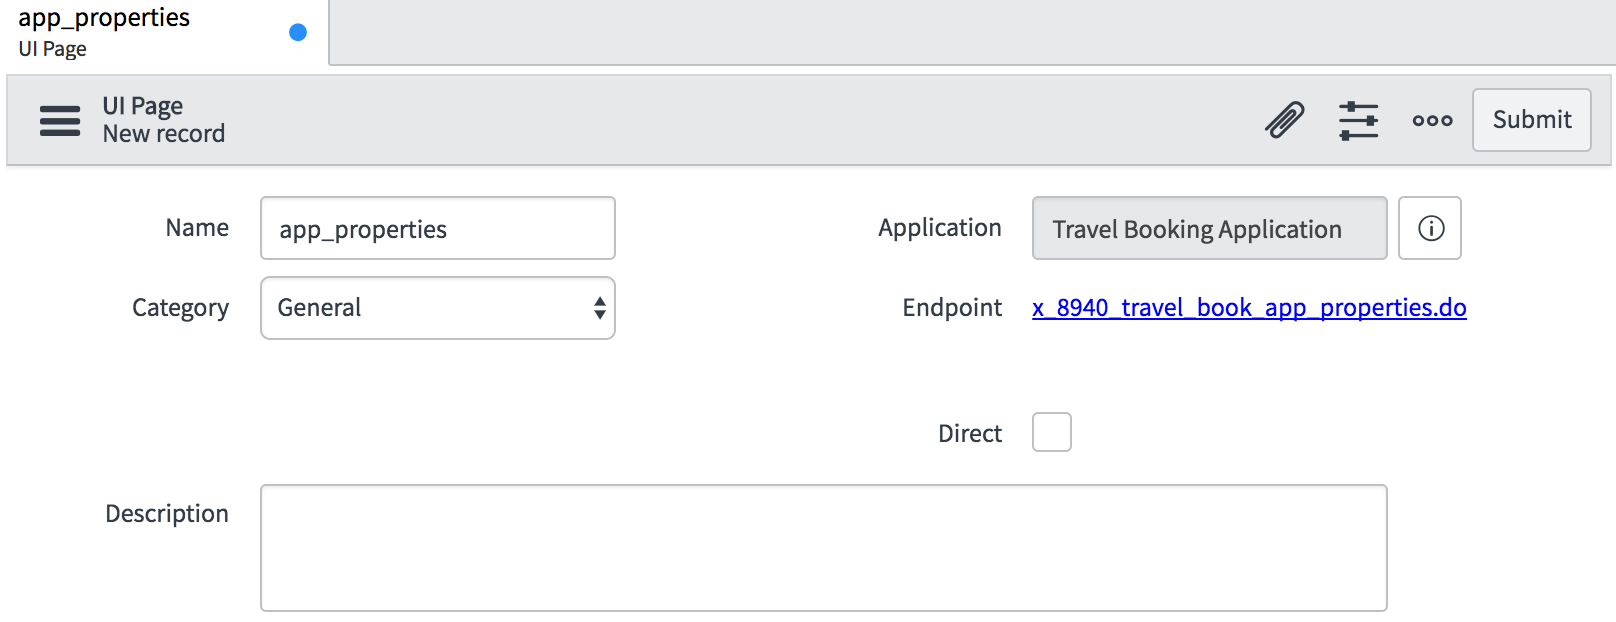 UI pages - ServiceNow Application Development